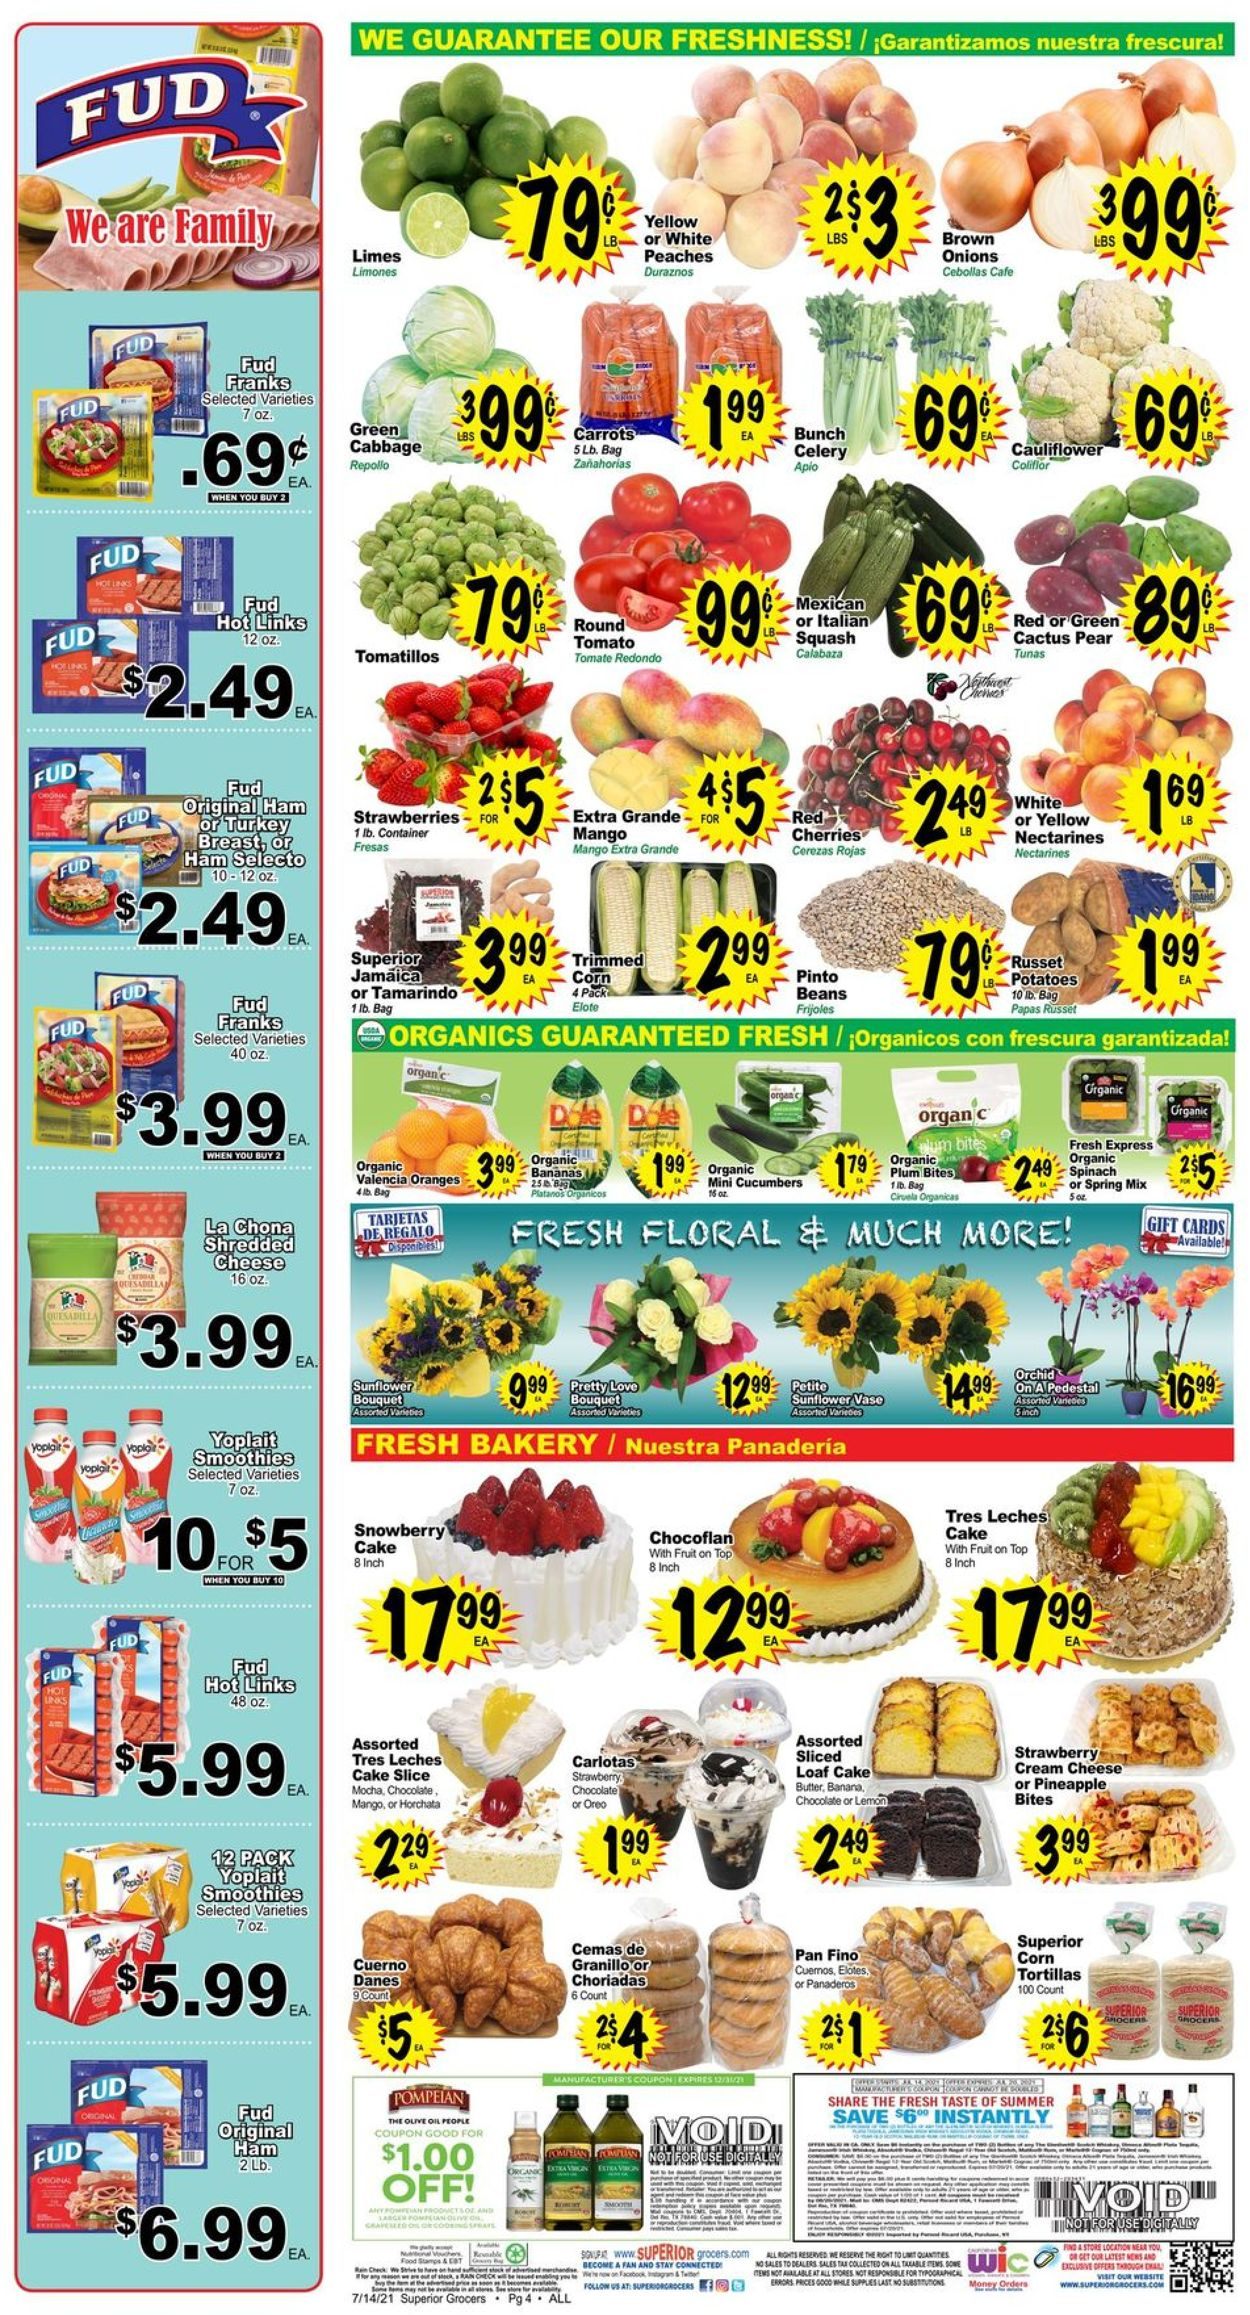 Superior Grocers Weekly Ad Circular - valid 07/14-07/20/2021 (Page 4)